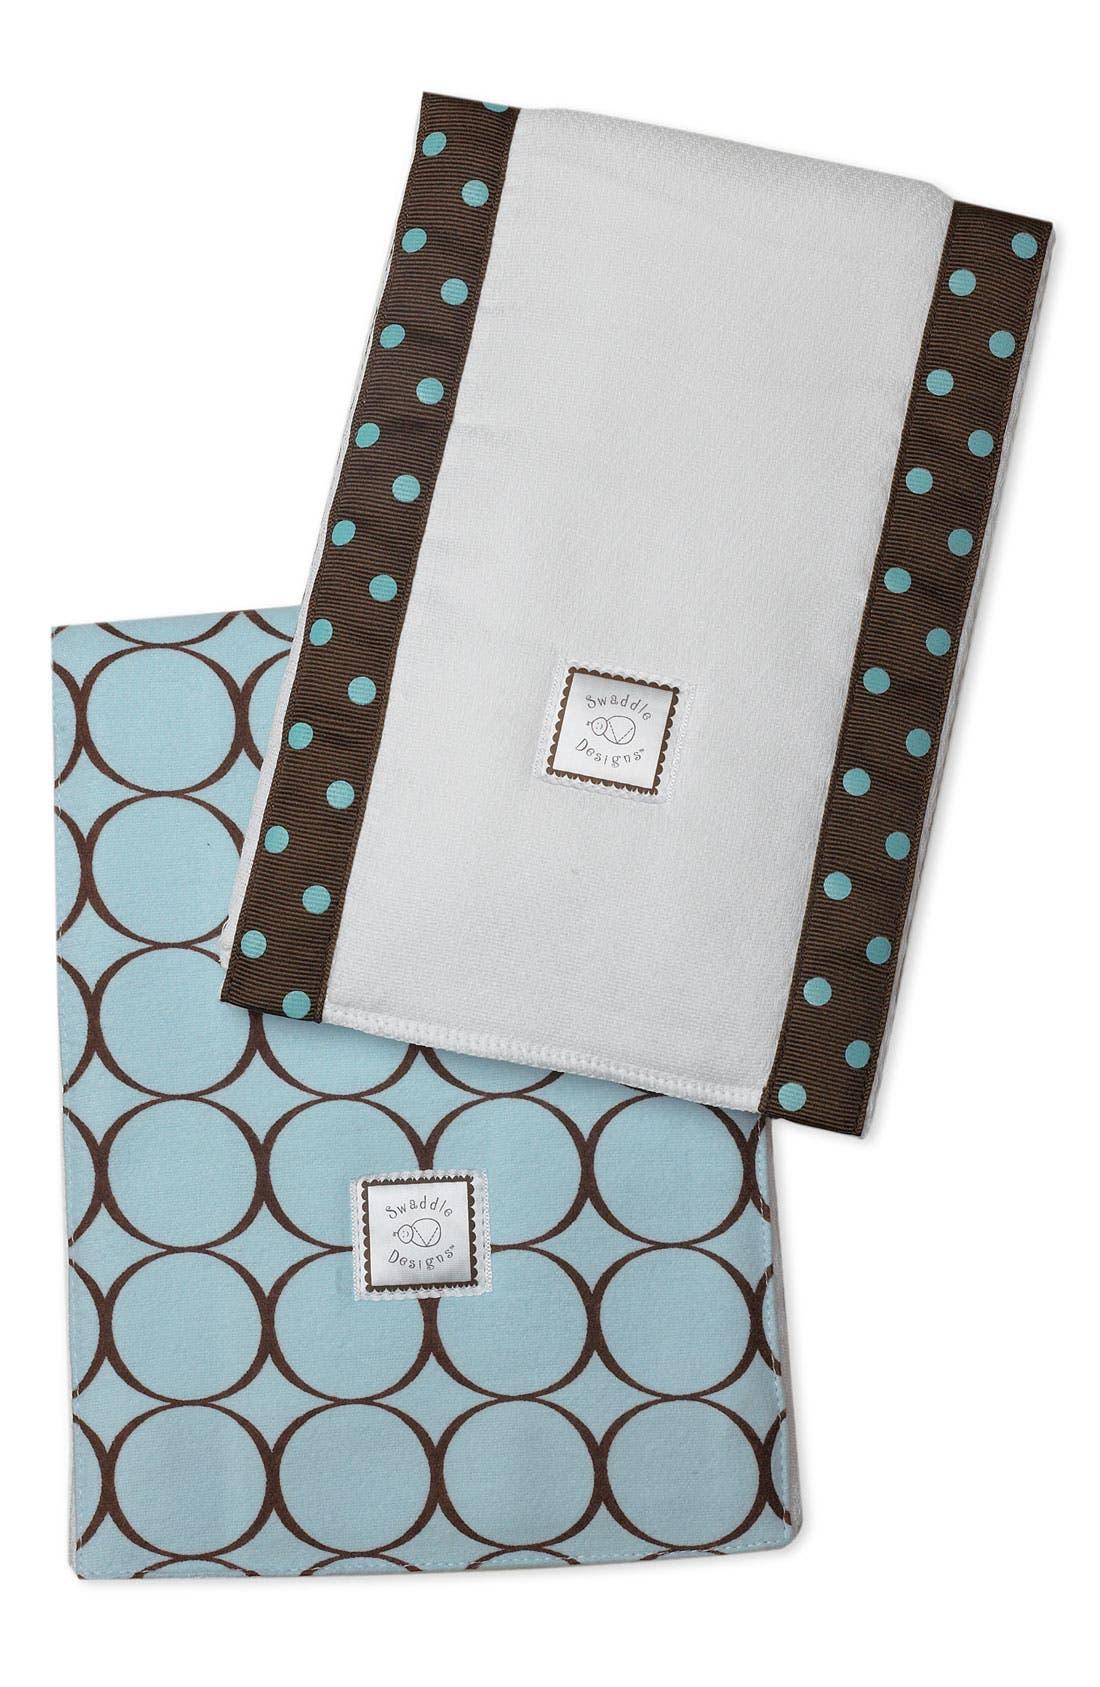 Alternate Image 1 Selected - Swaddle Designs Burp Cloth Set